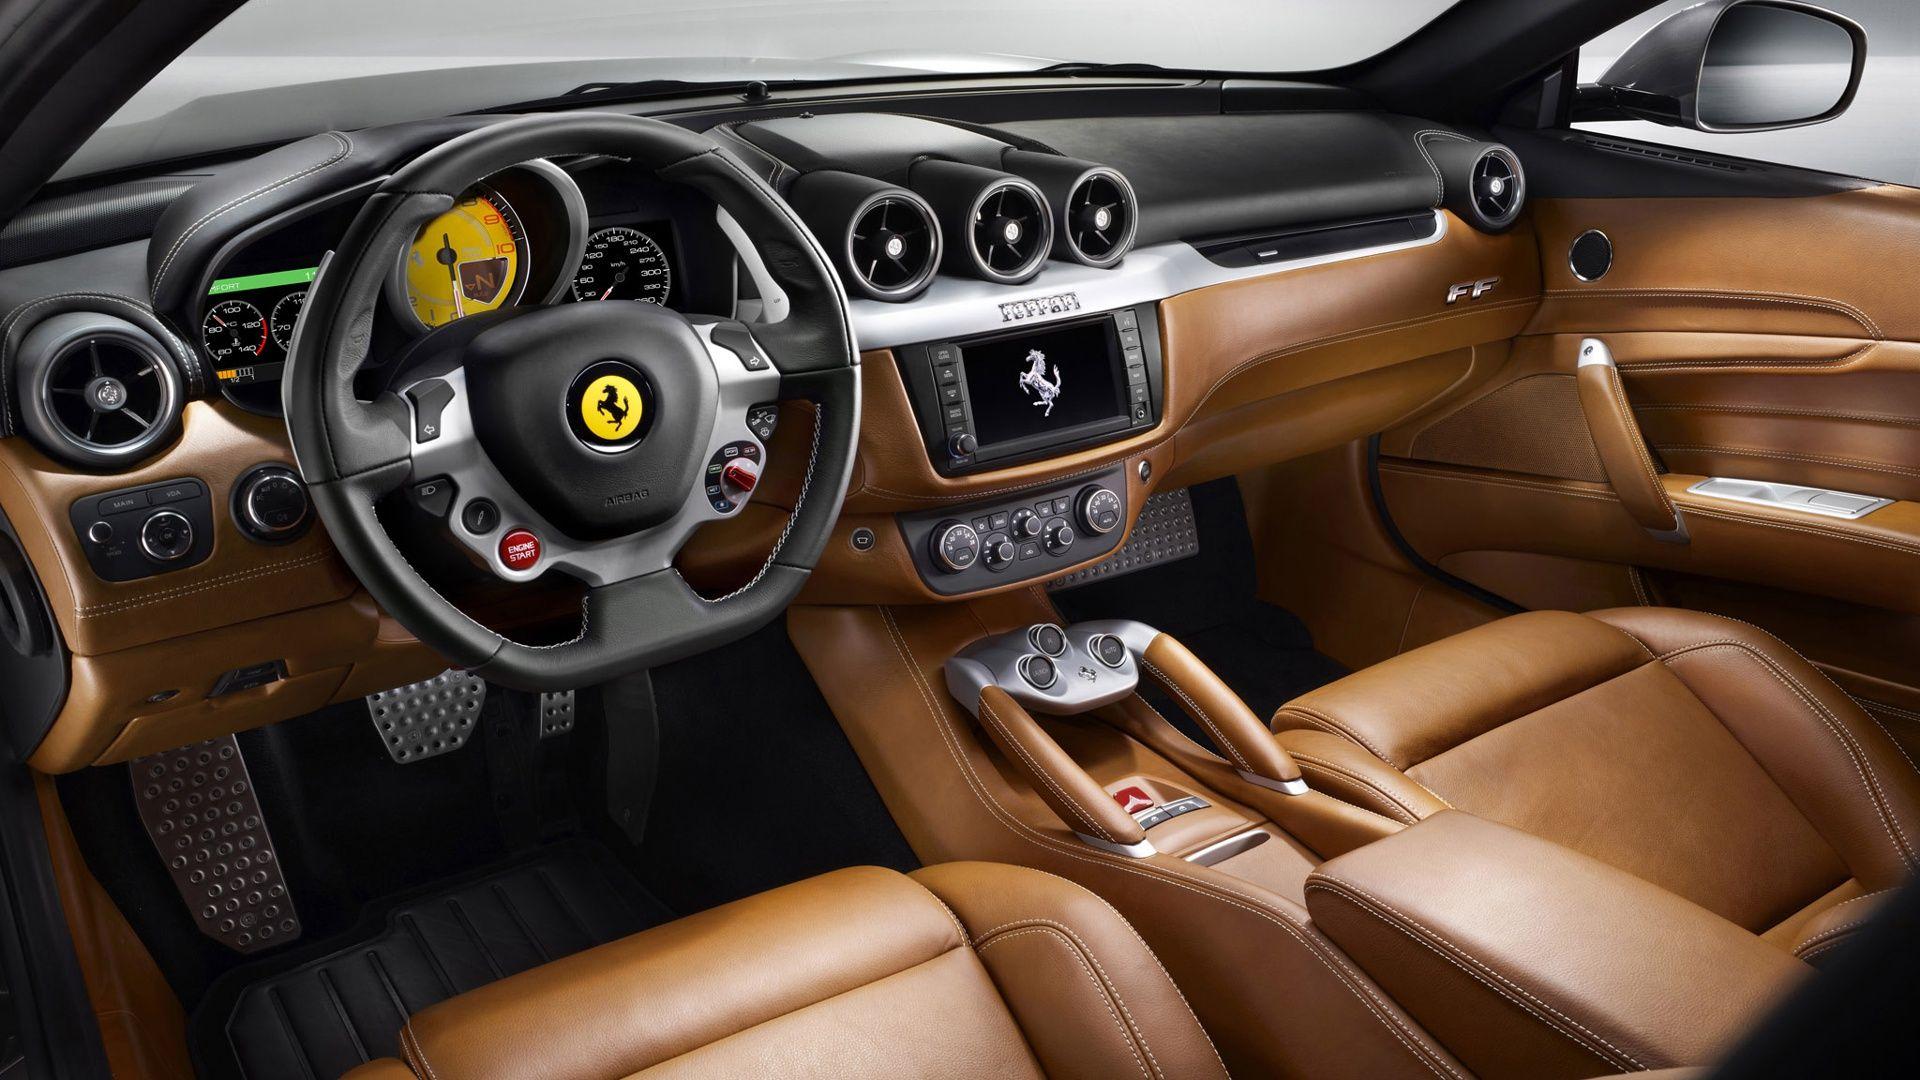 2012 Ferrari Ff Top Speed Ferrari Car Ferrari Car Interior